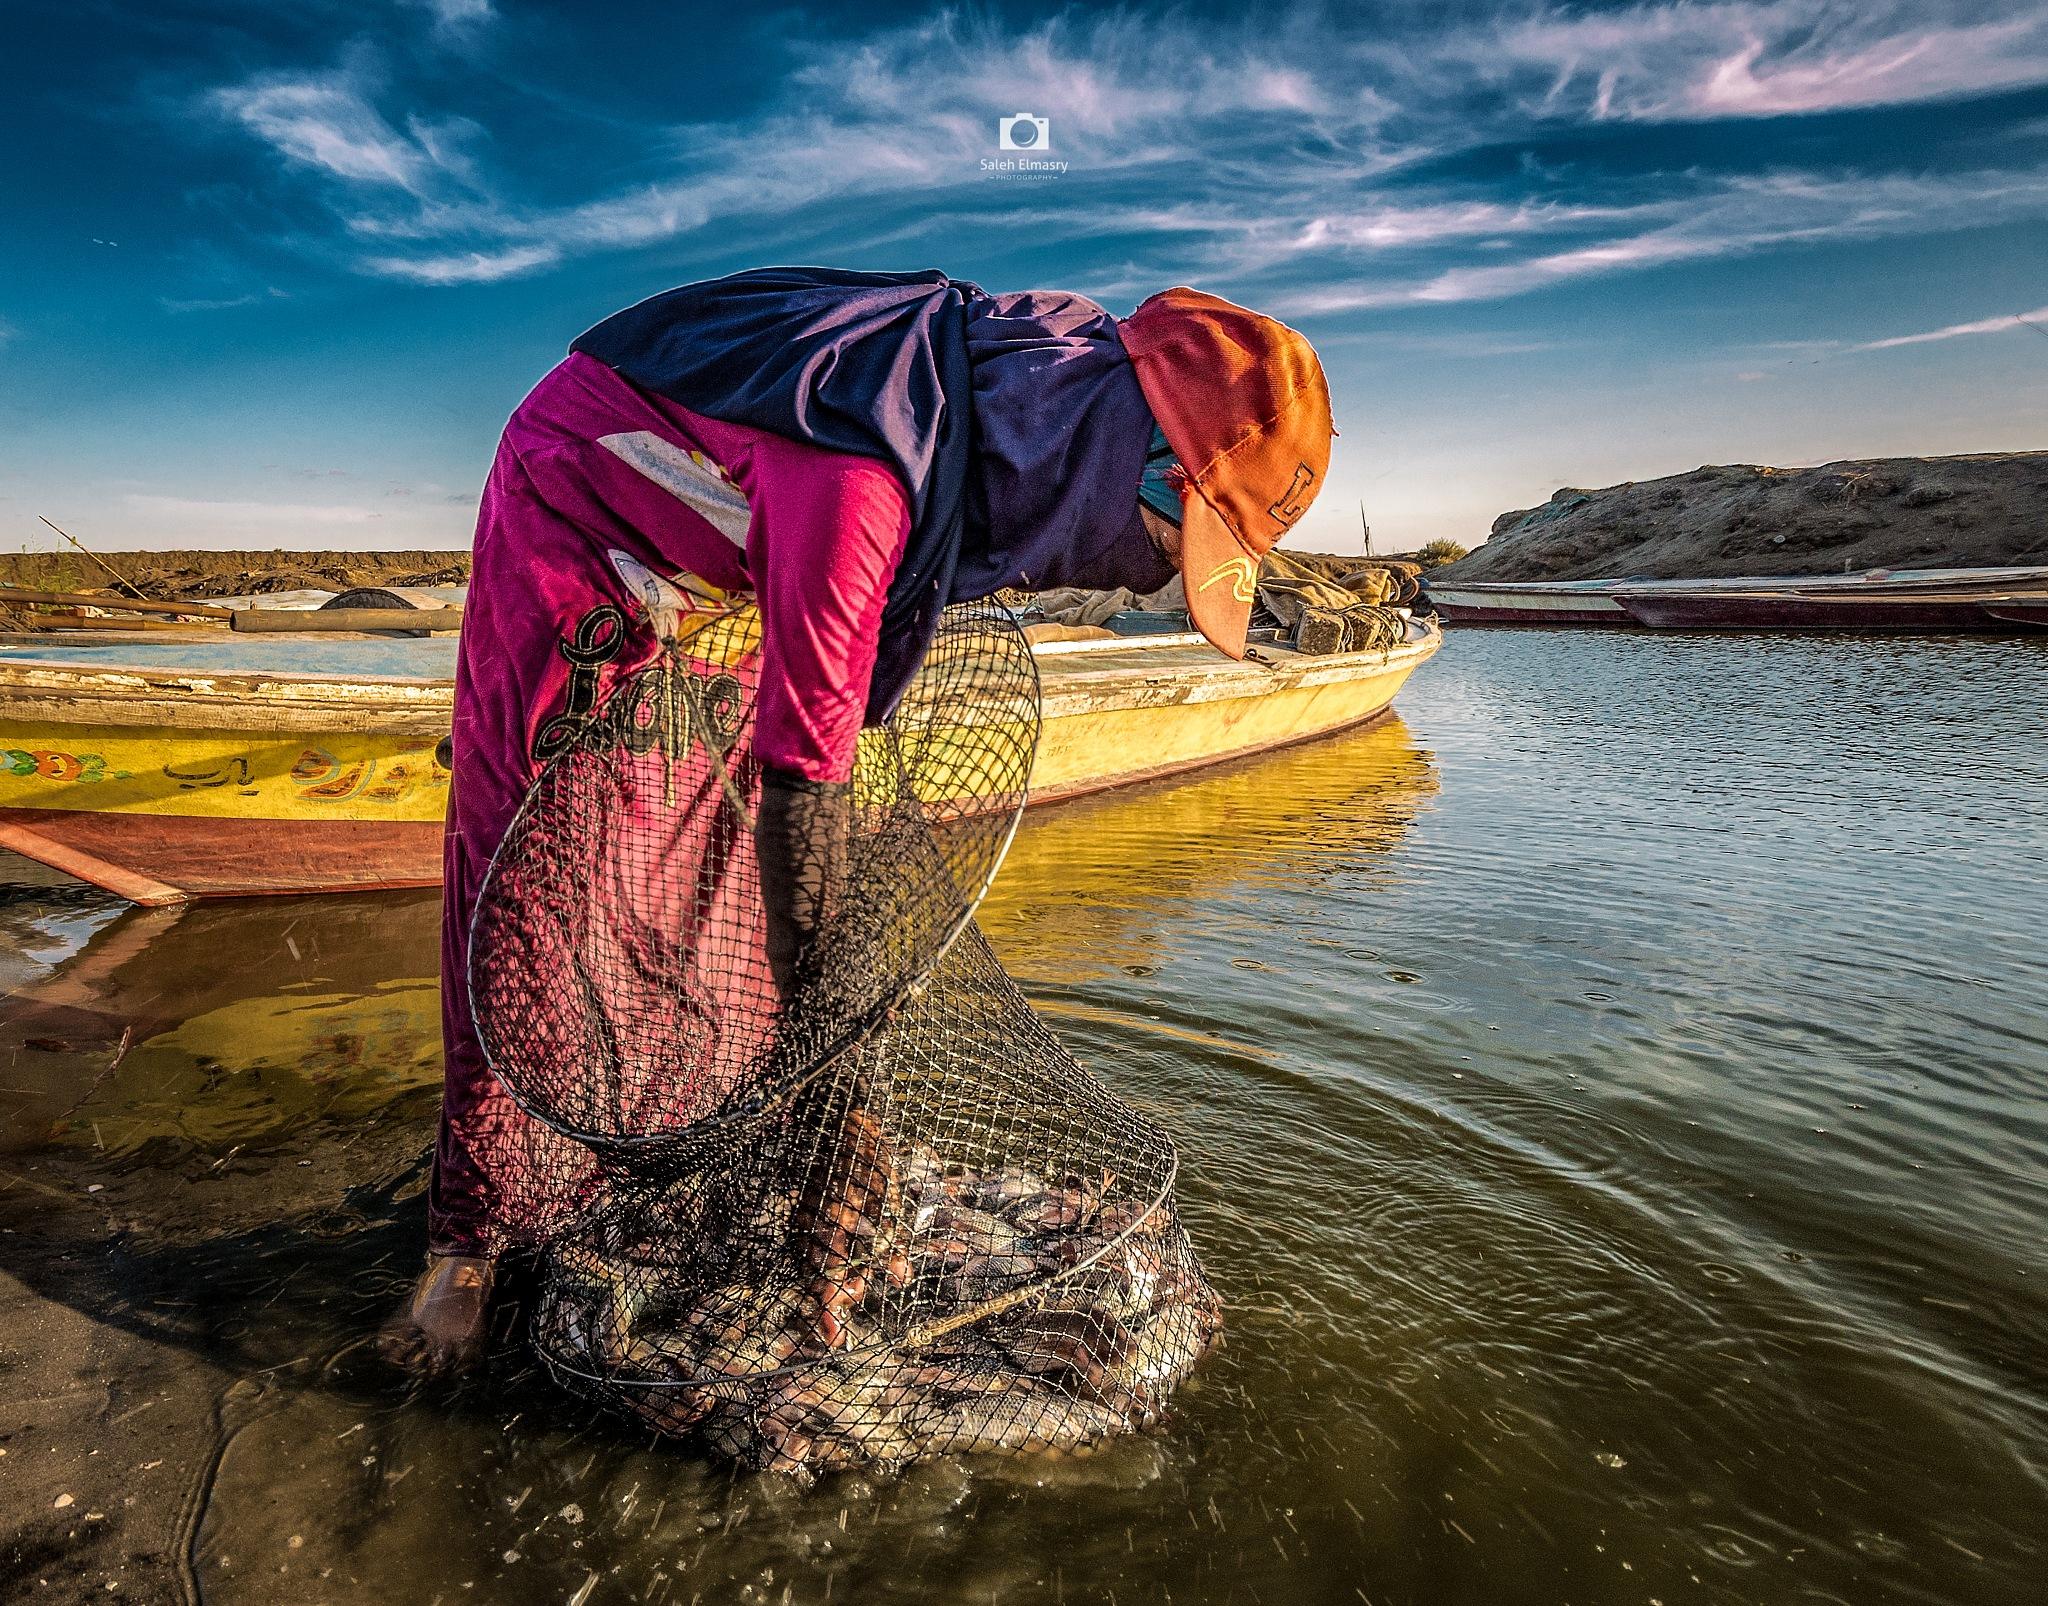 Fishing in Lake Burullus by Saleh Almasry